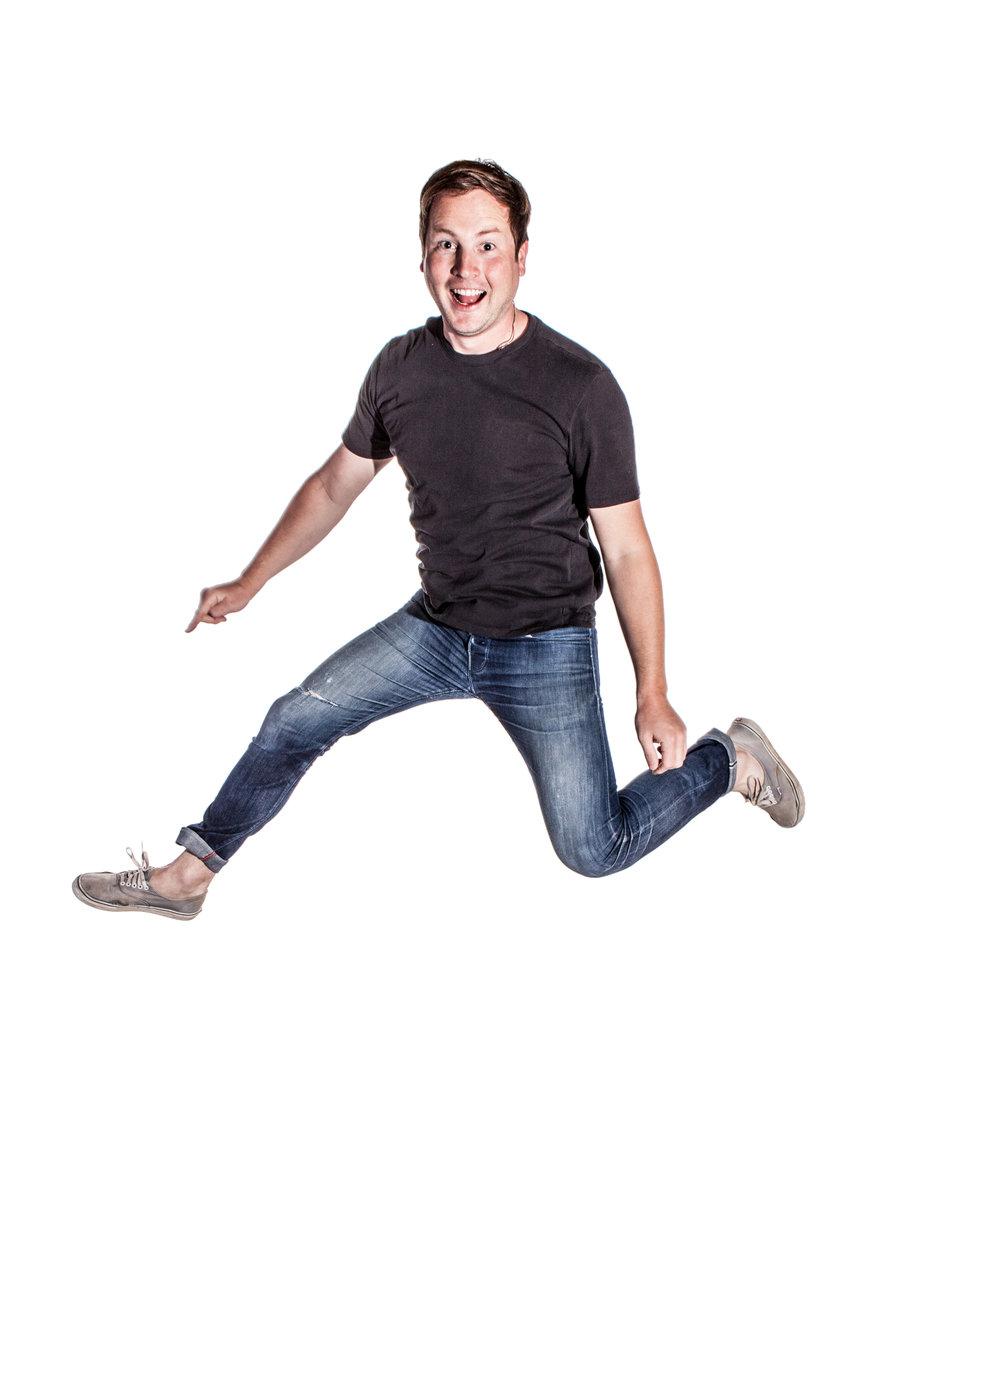 jumpingjamie2.jpg